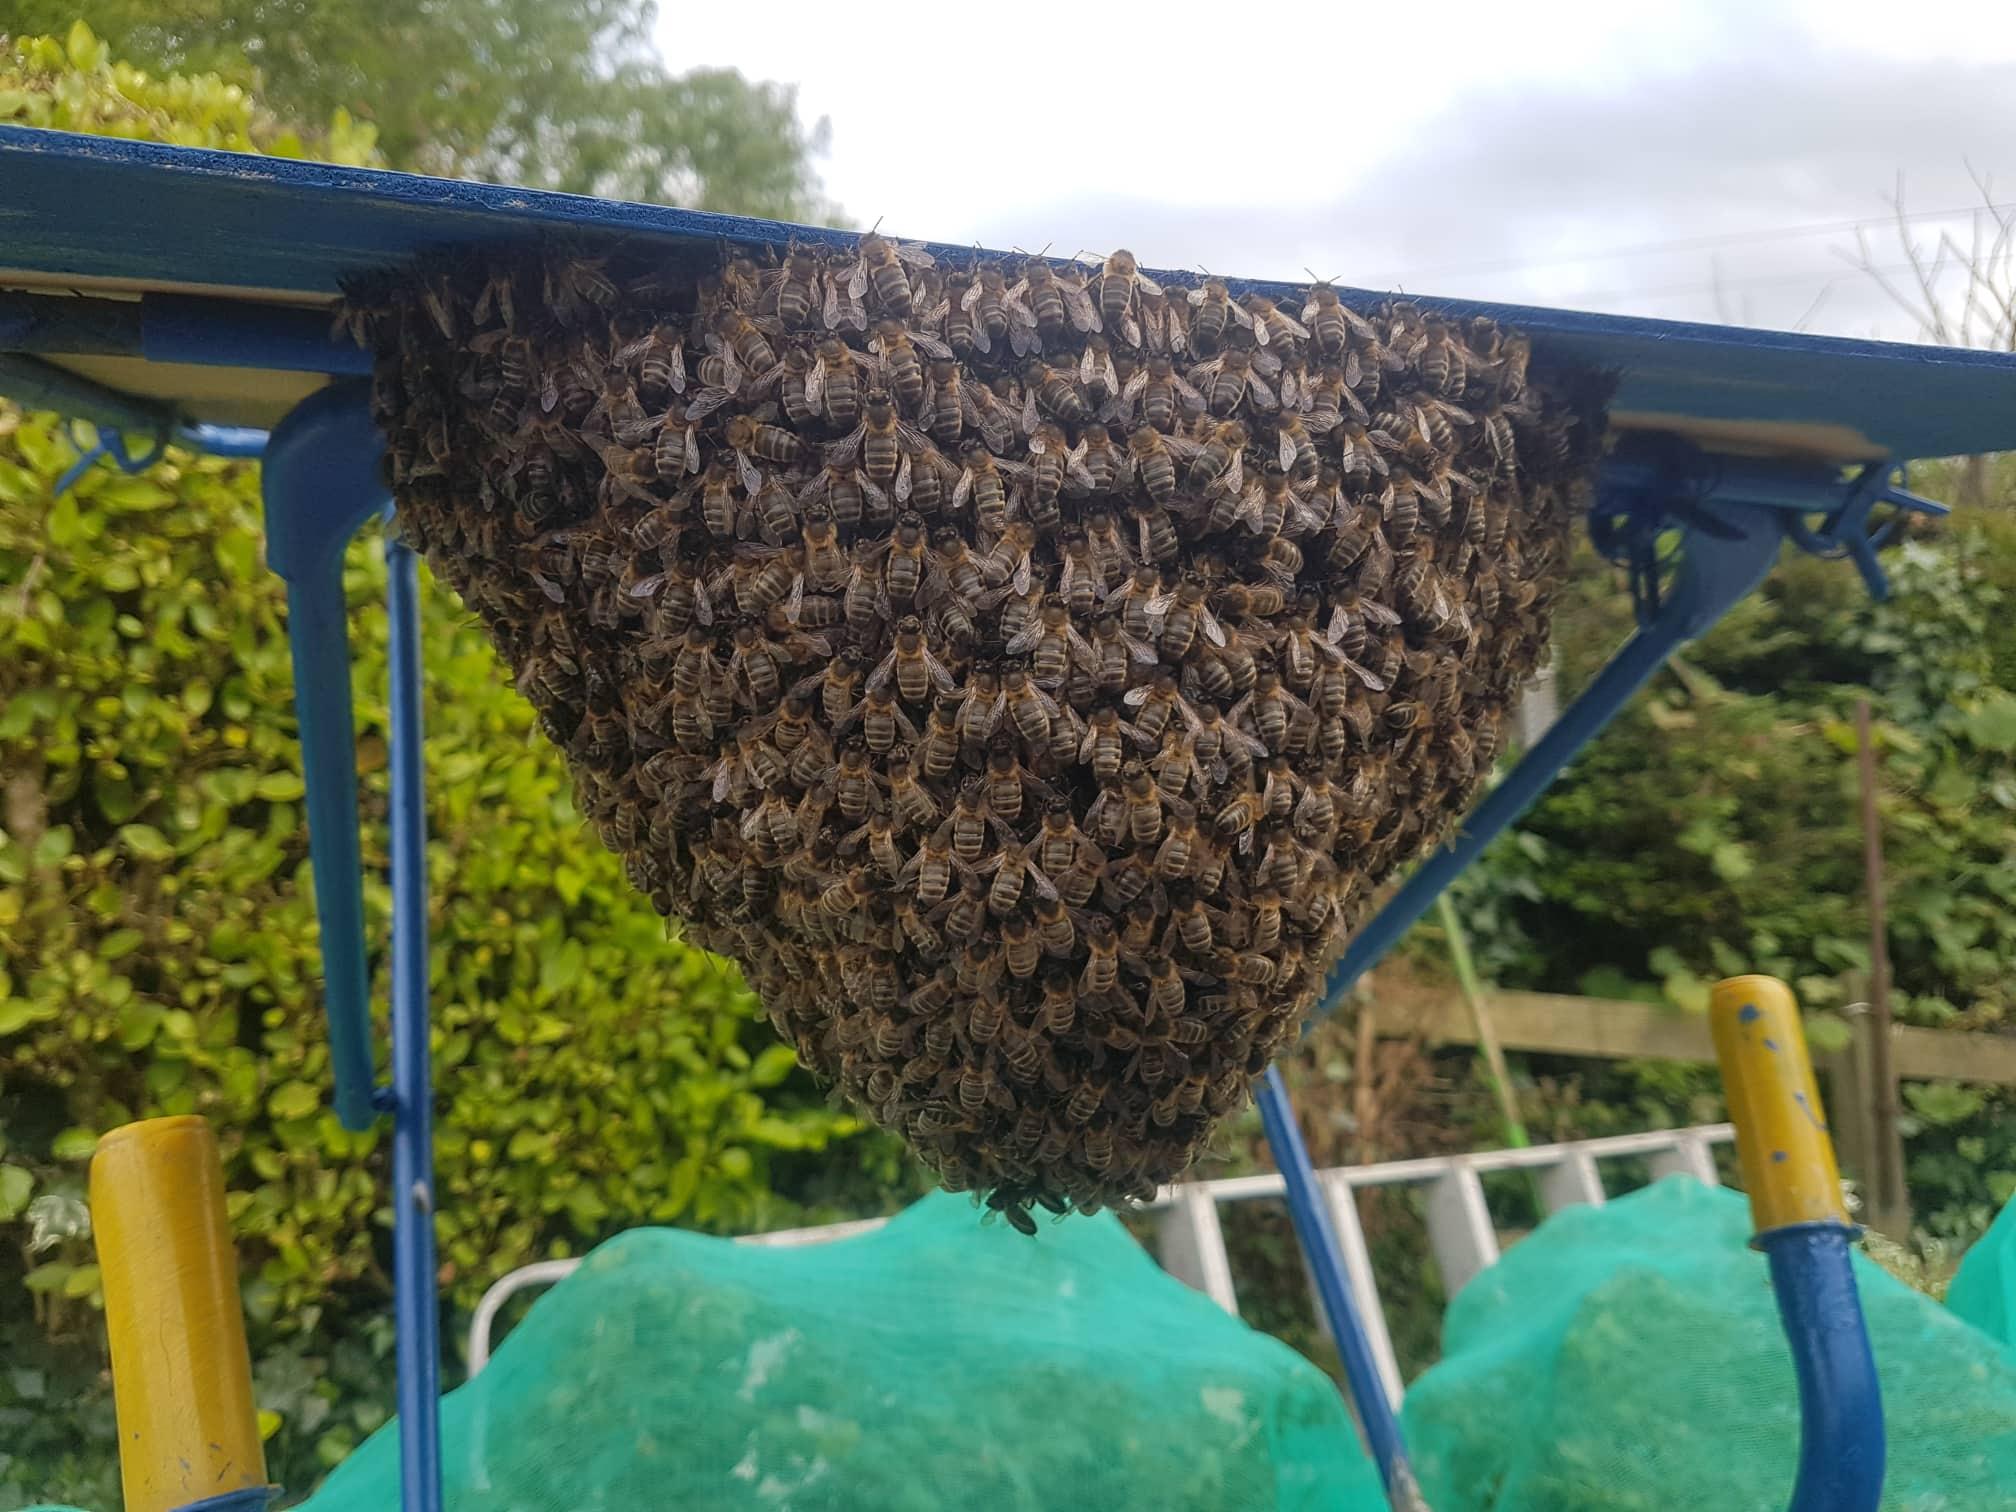 Bees! Help!